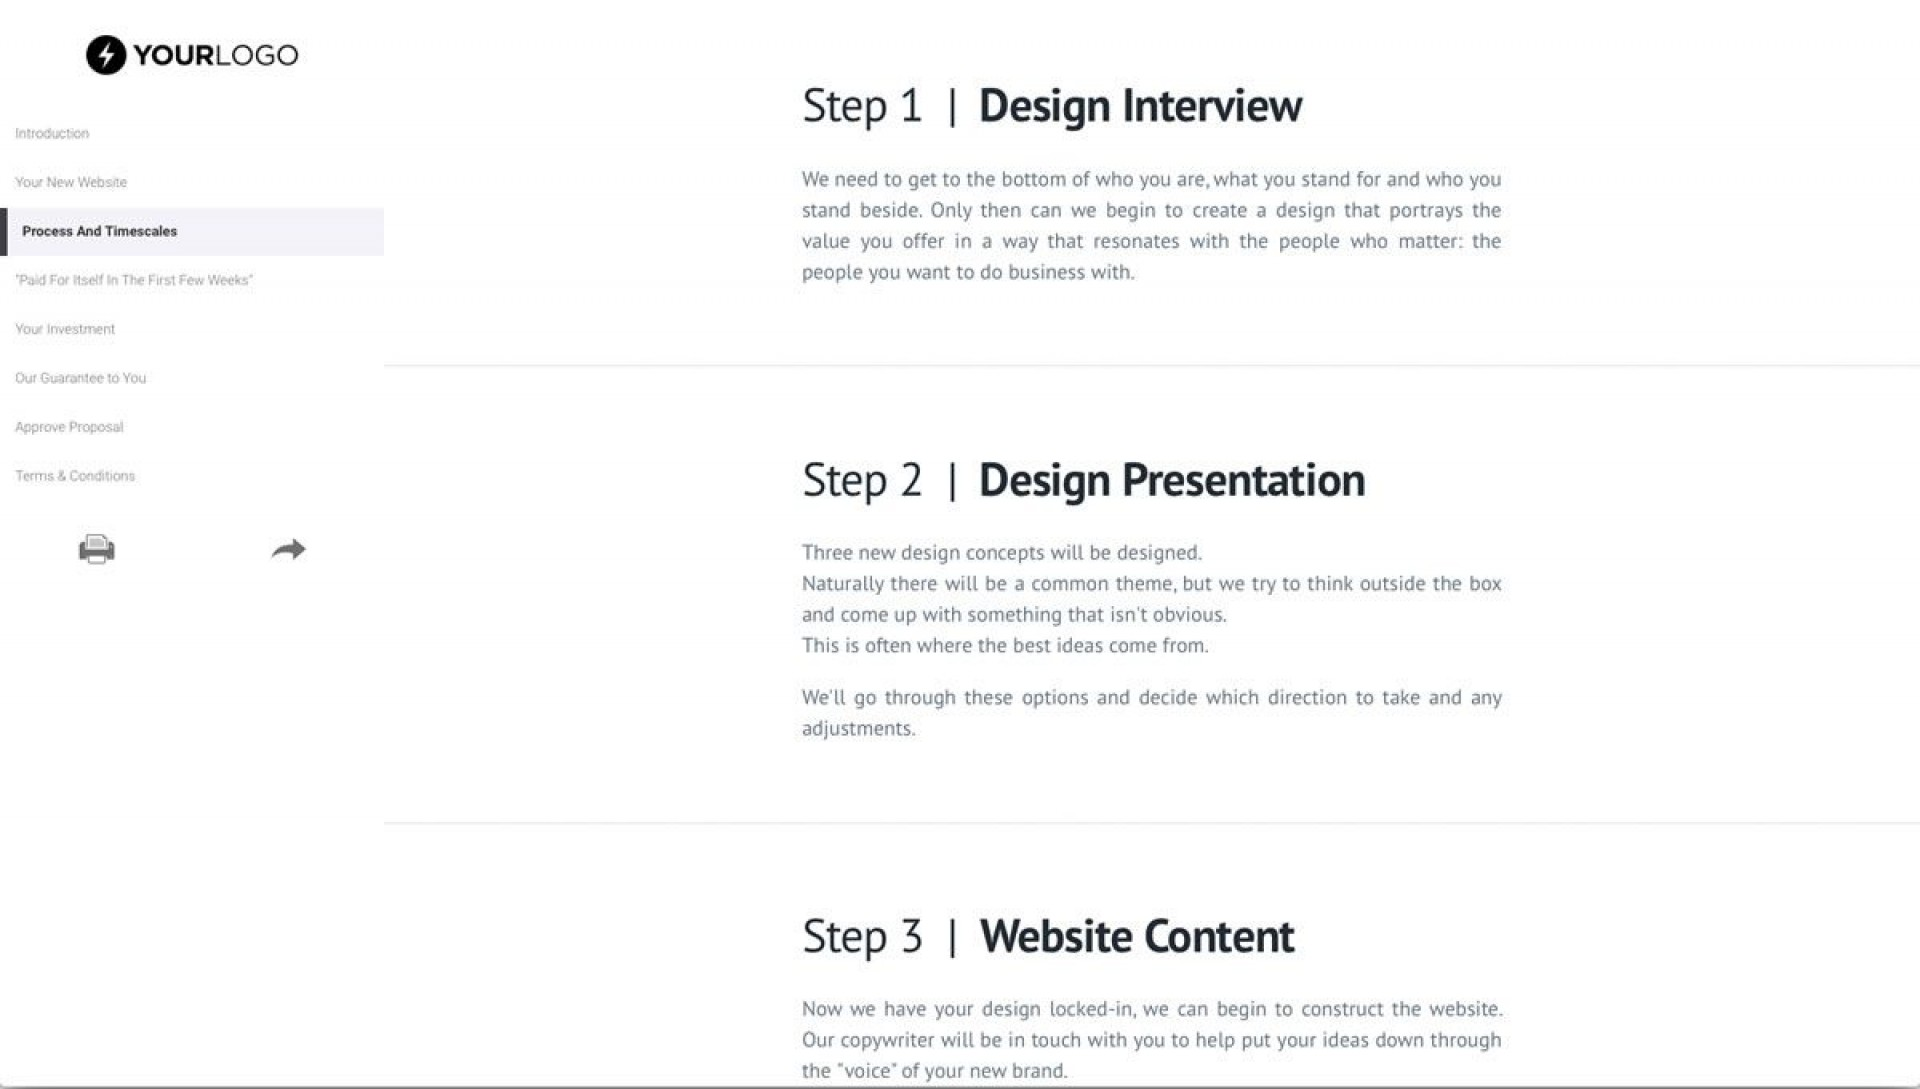 008 Incredible Freelance Website Design Proposal Template High Def 1920